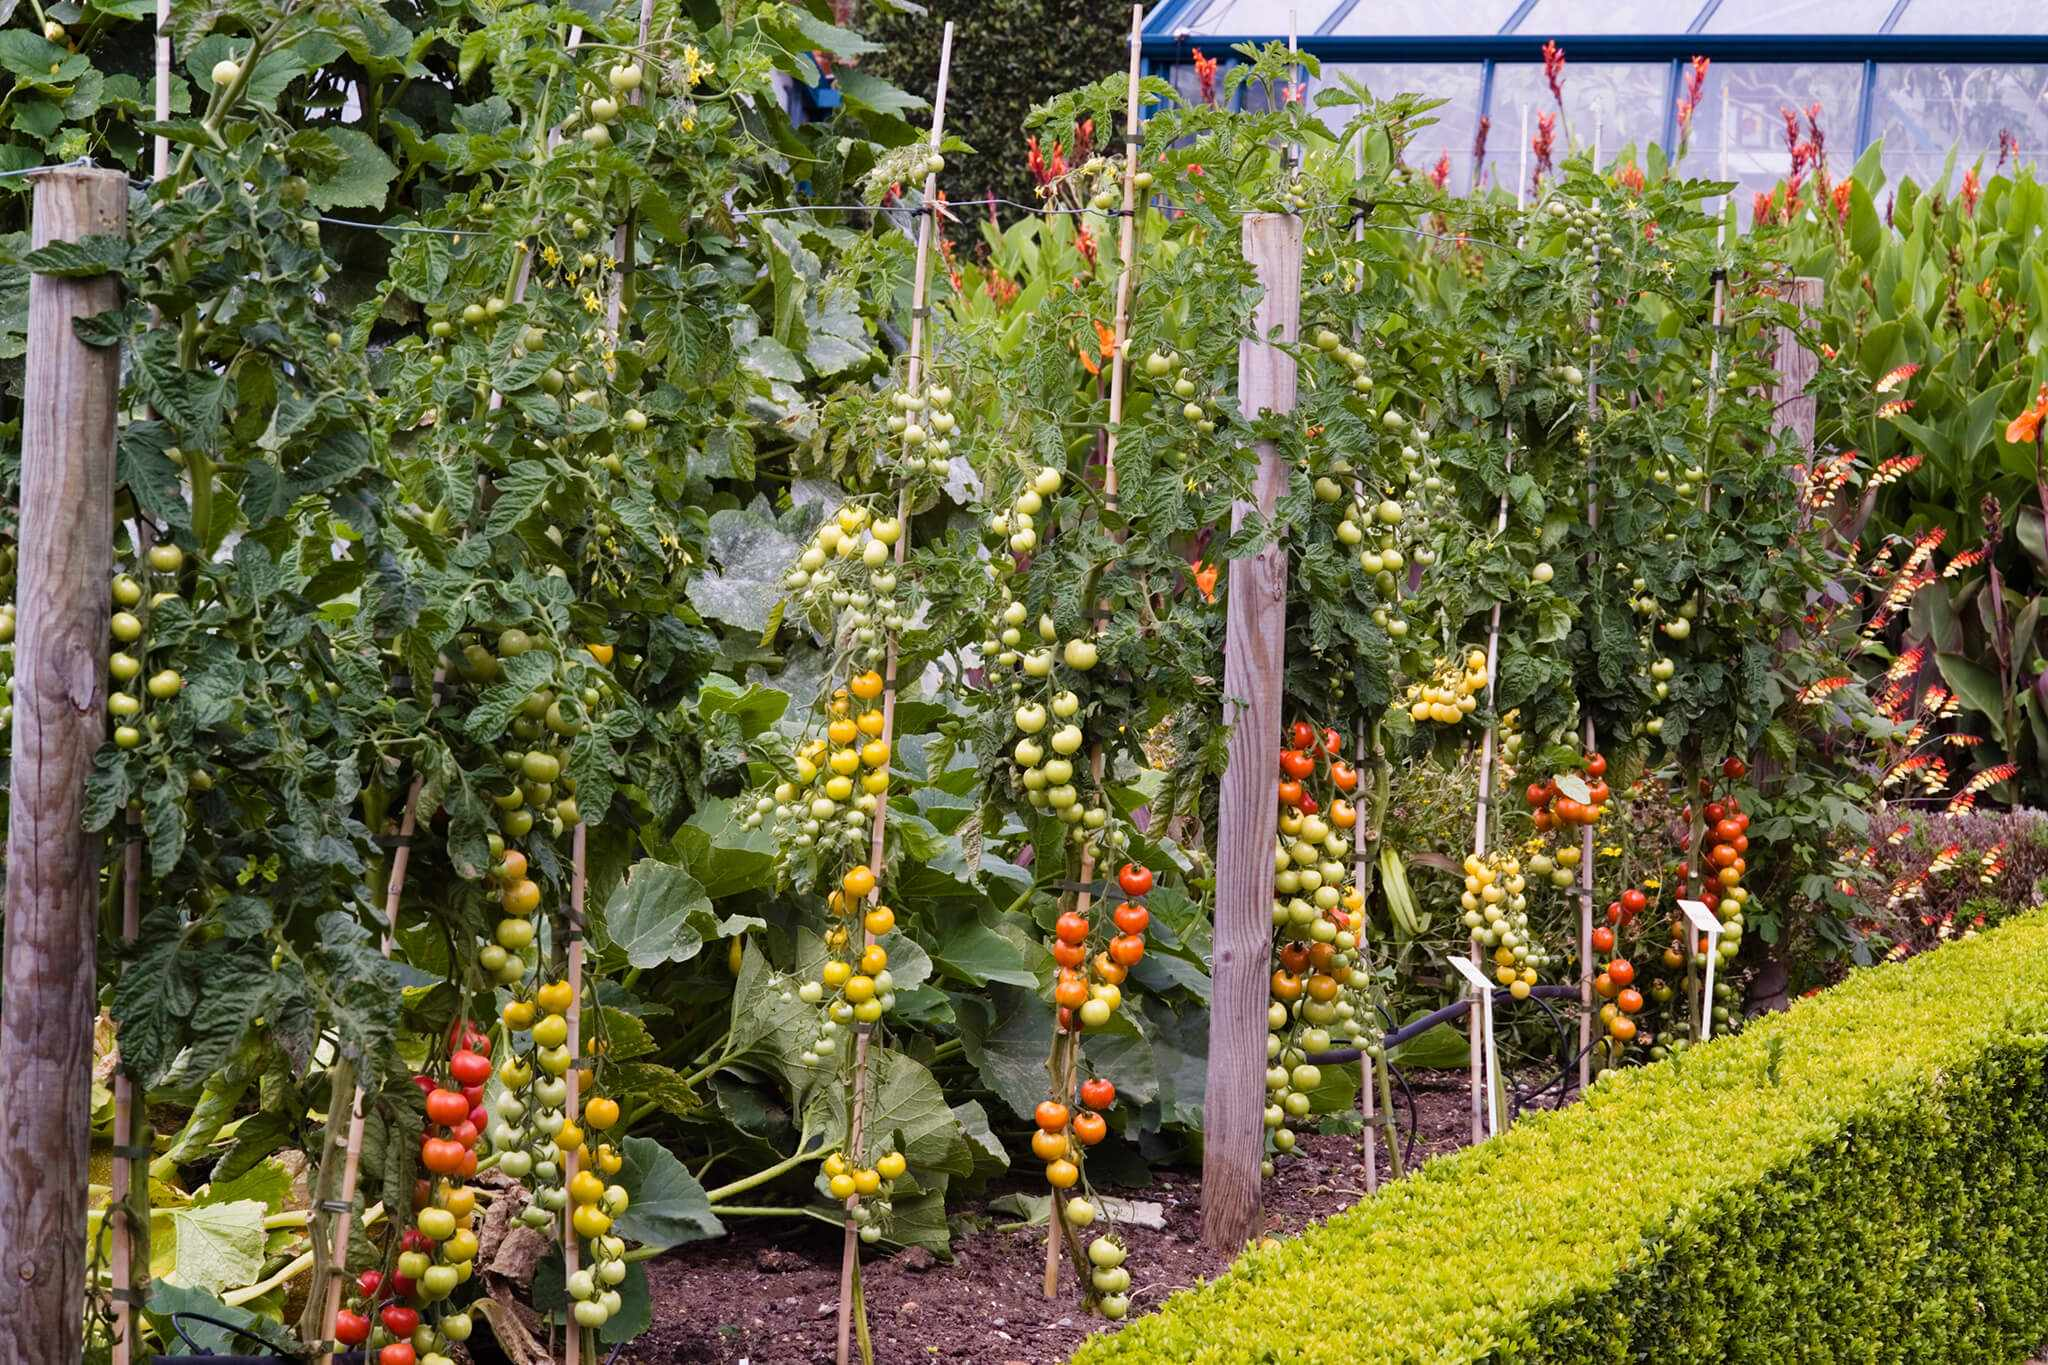 Cordon tomatoes